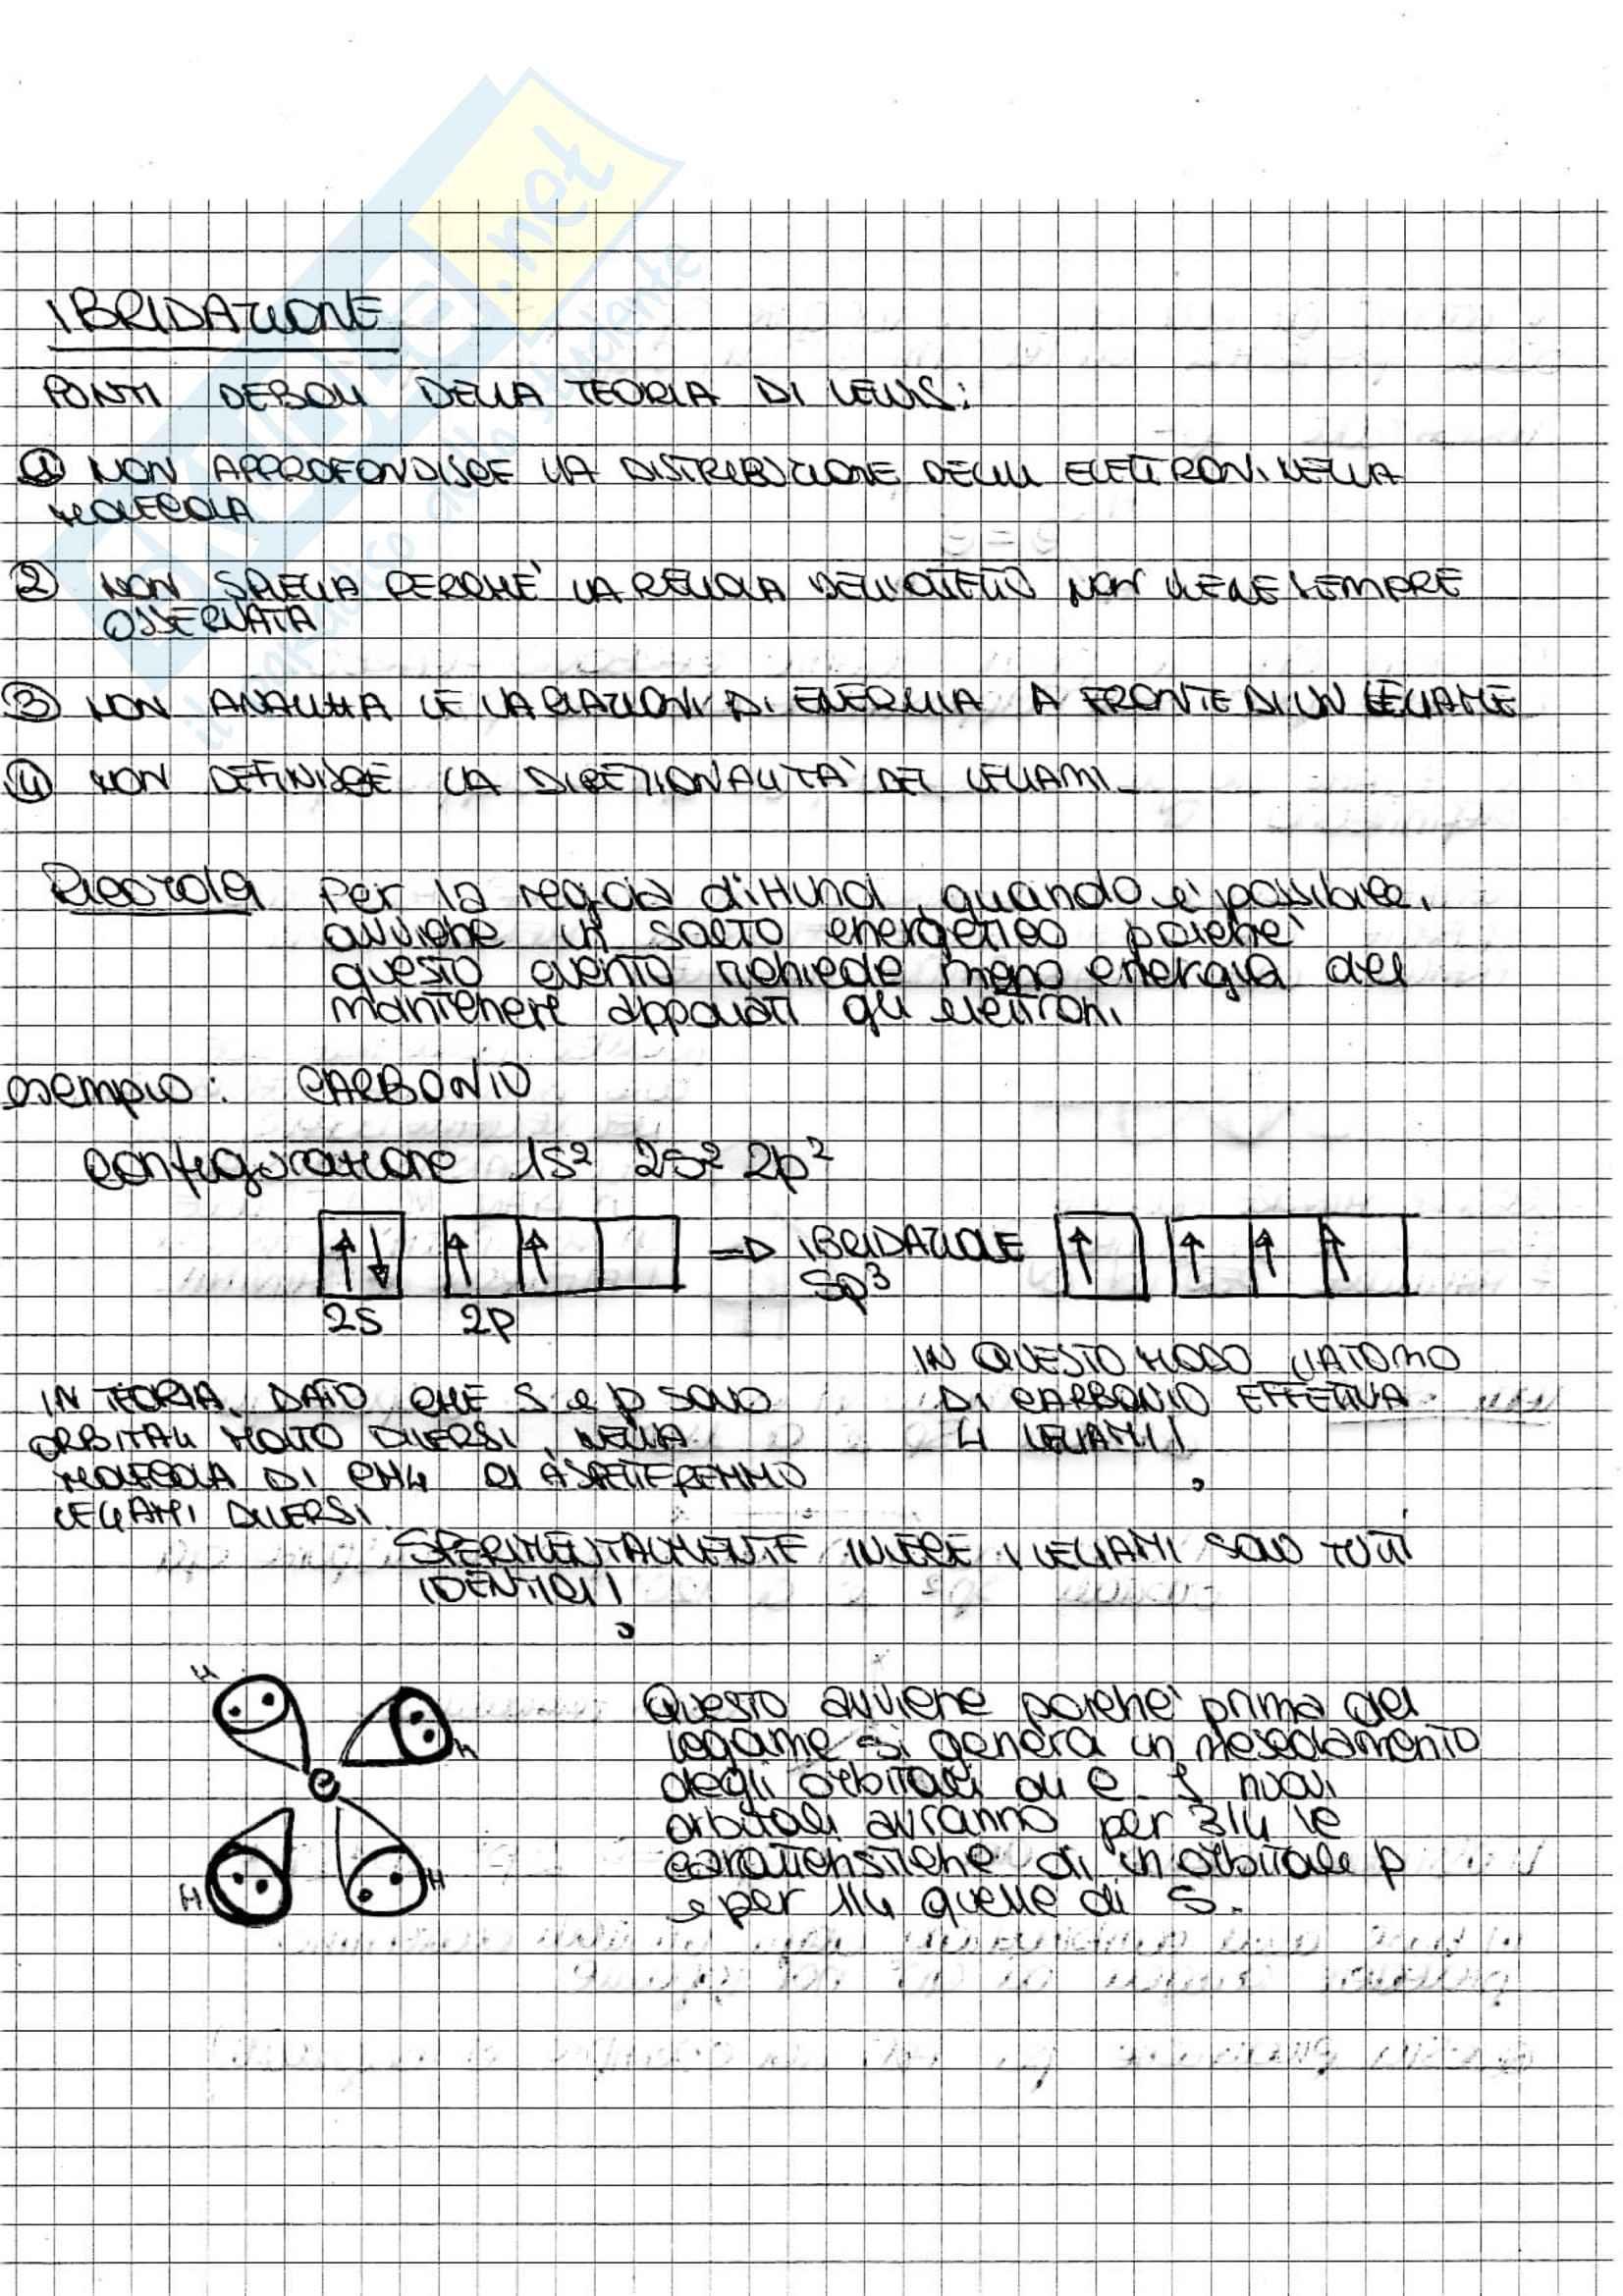 appunto A. Accardo Chimica generale